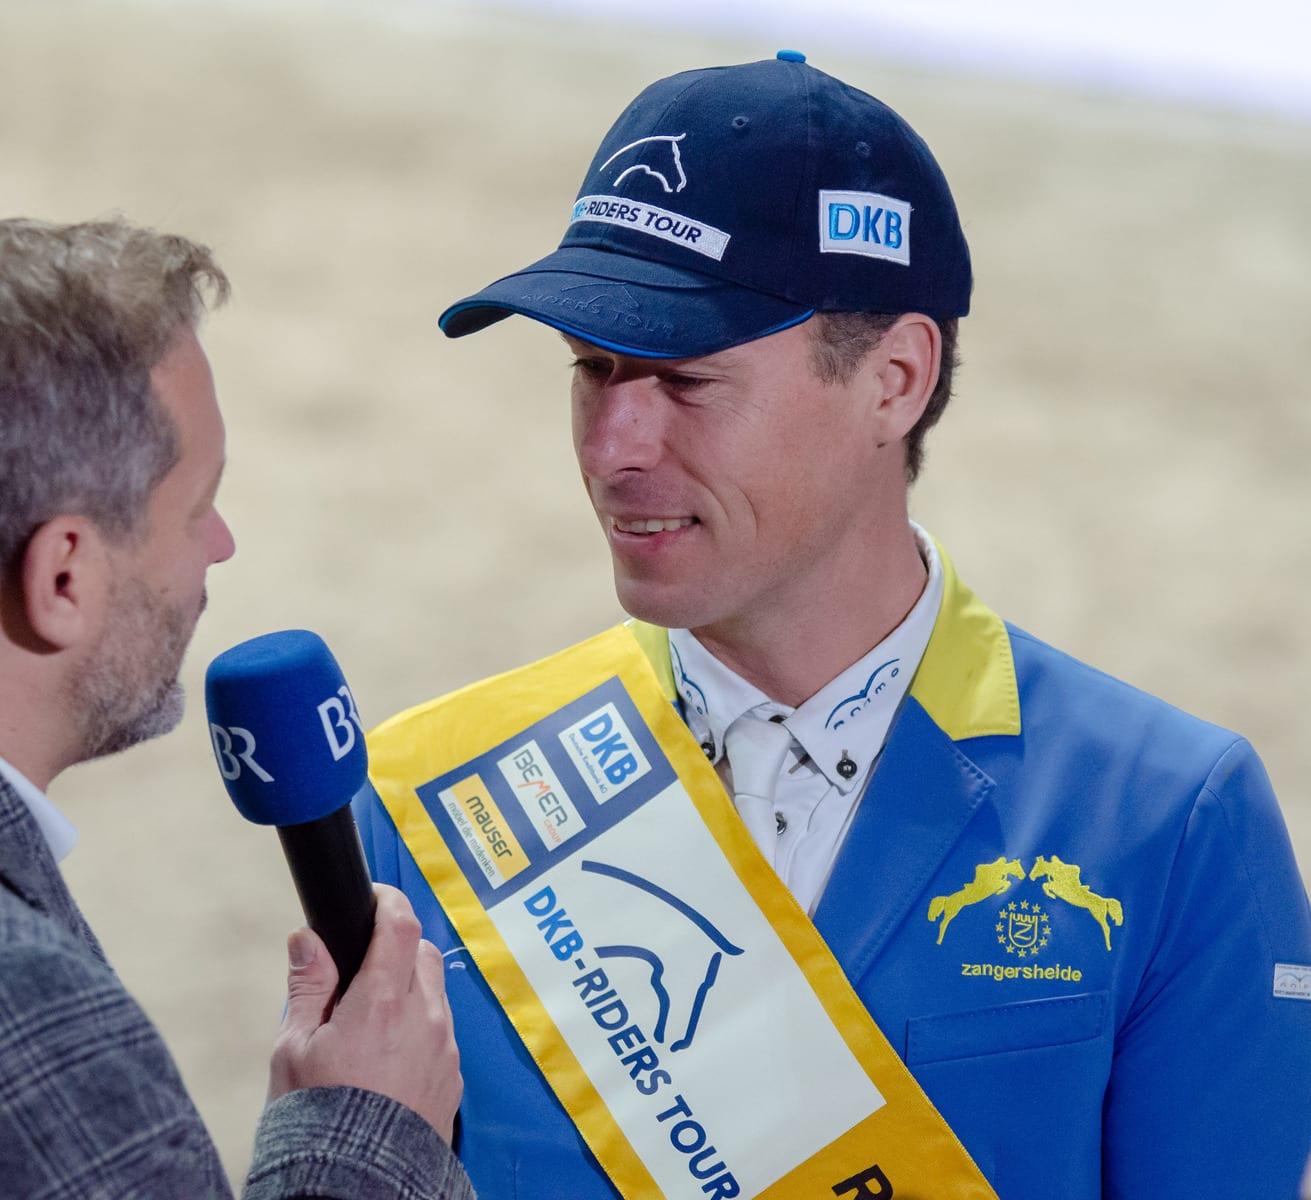 Christian Ahlmann im Siegerinterview